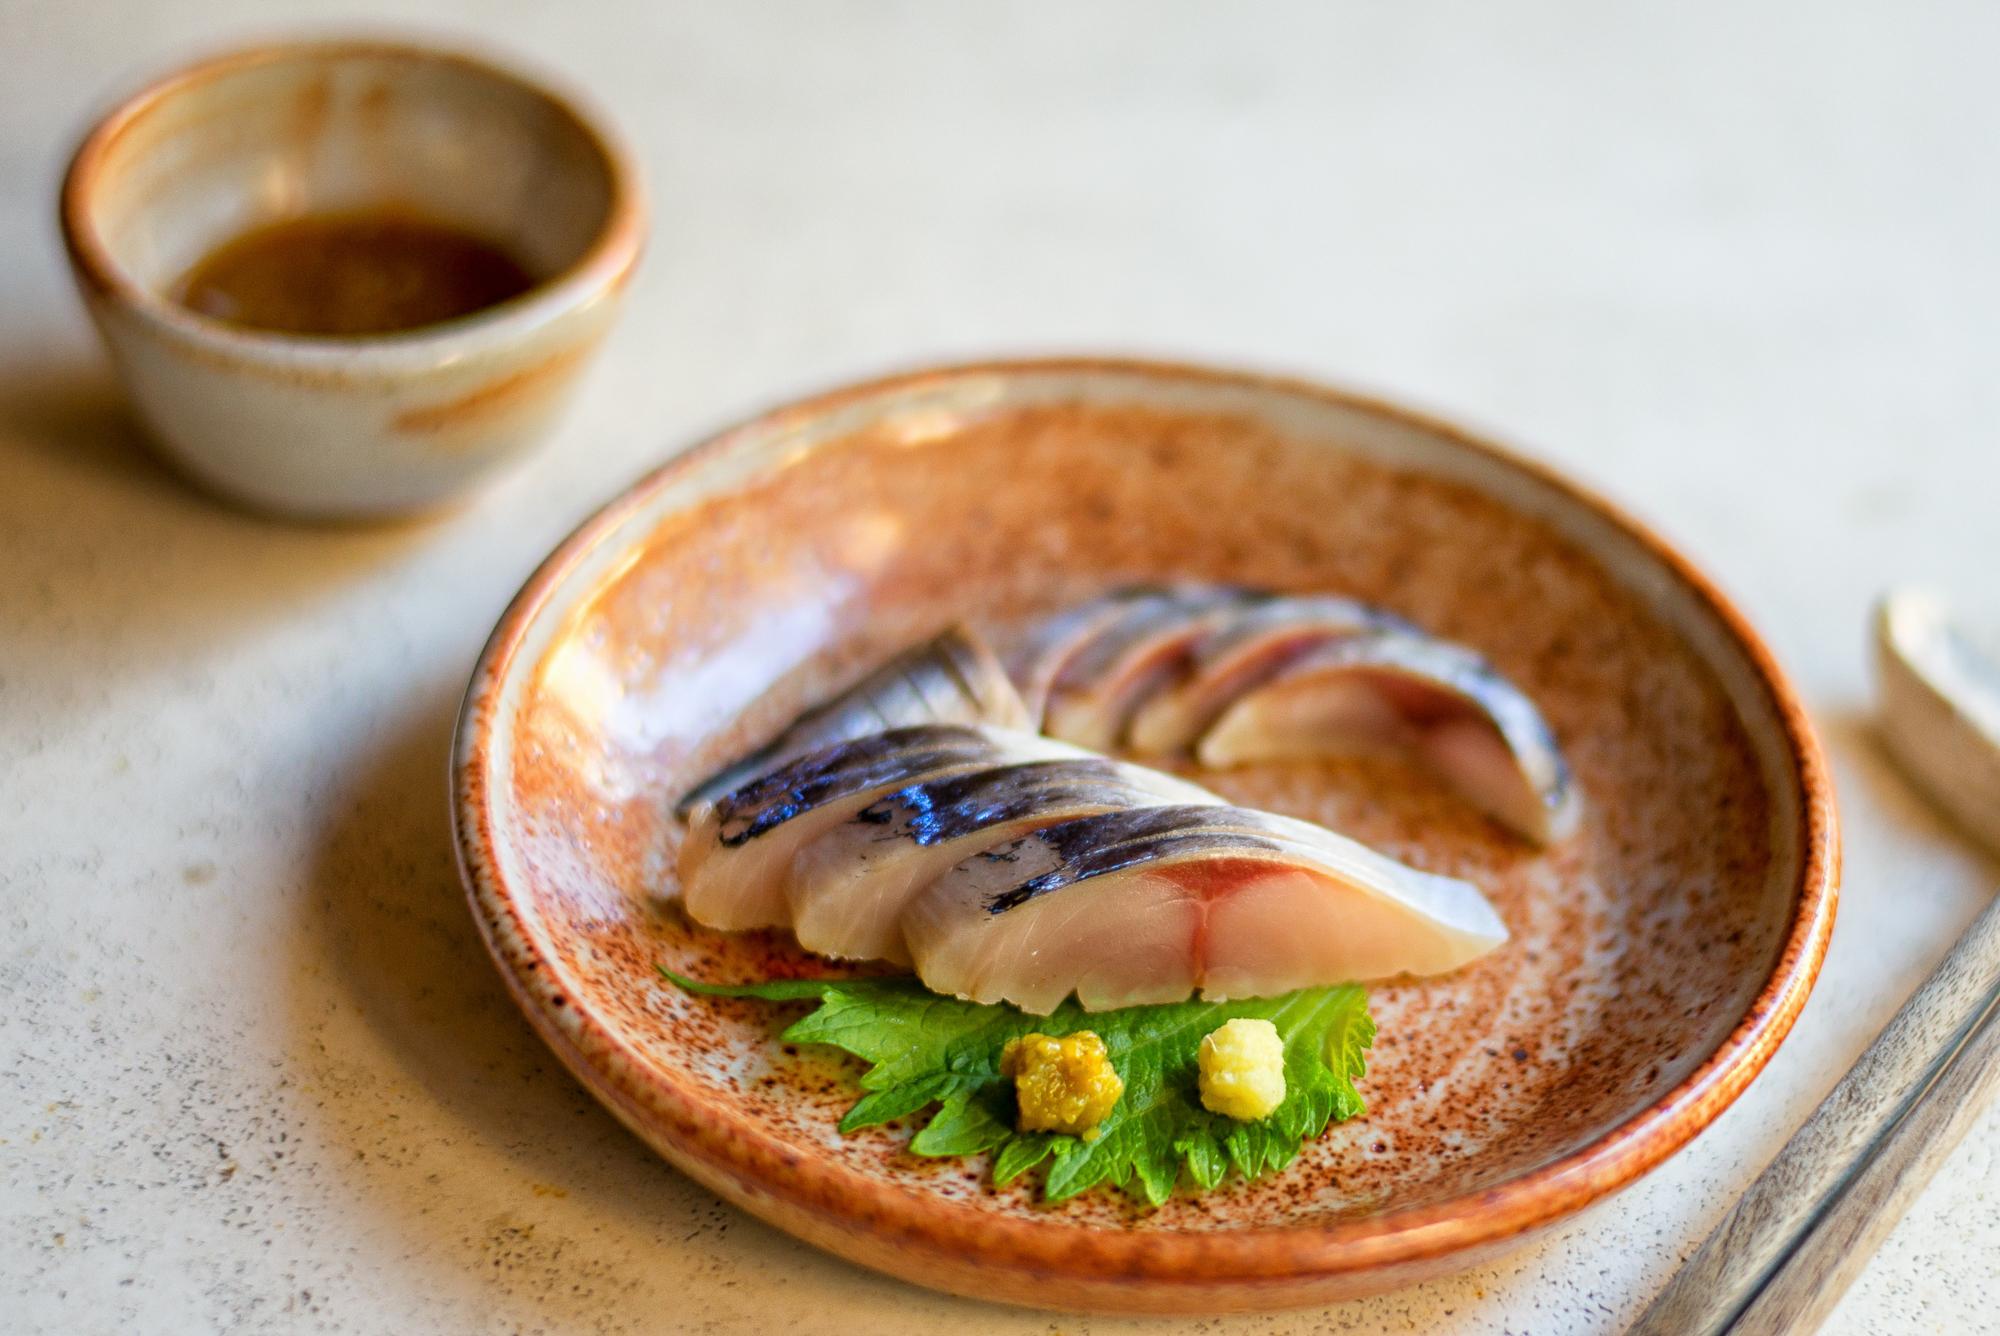 A fish plate from Okonomi